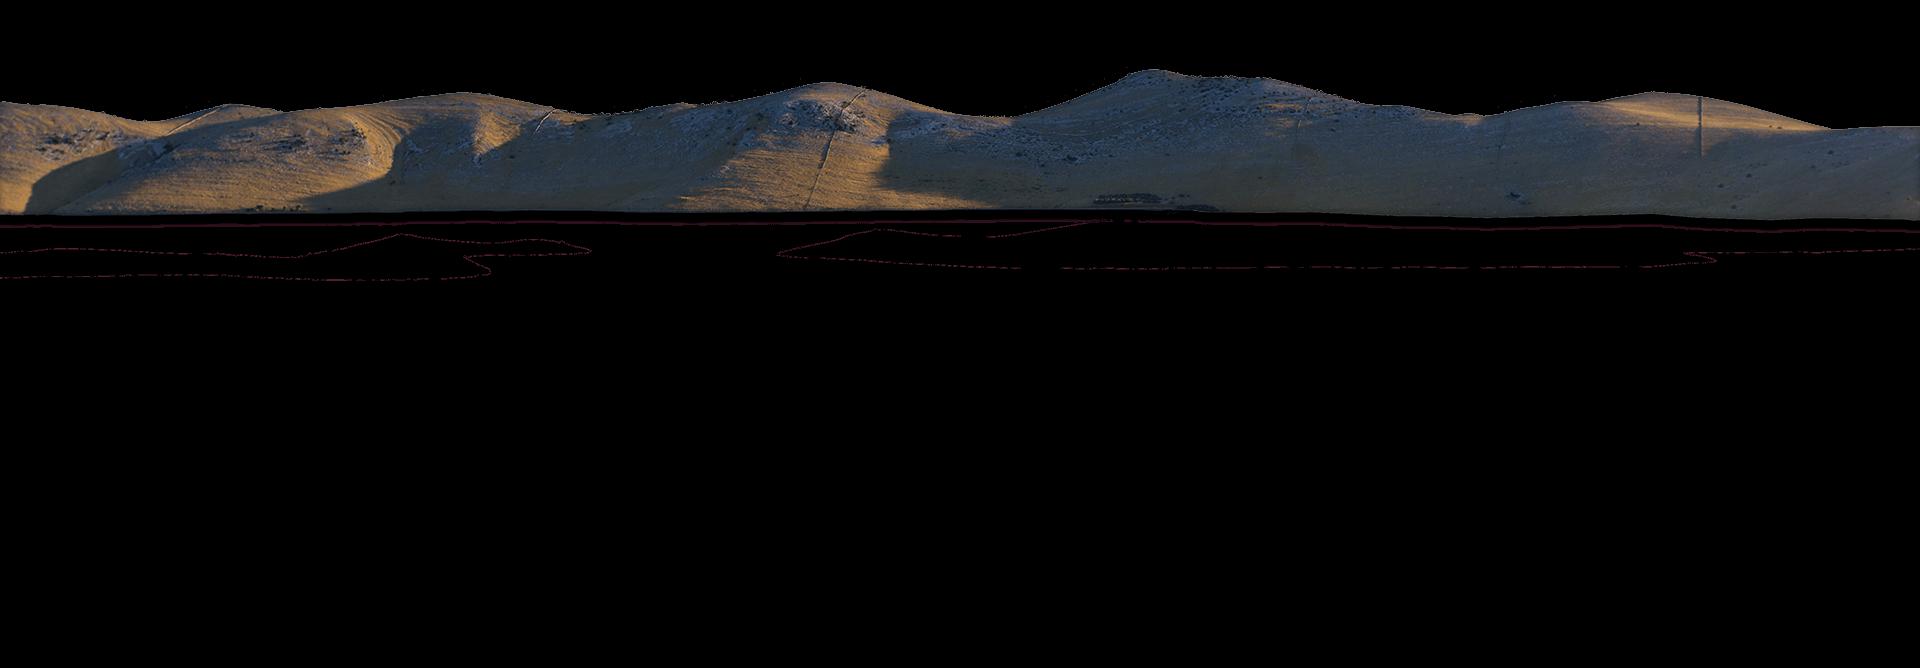 azena-paralax-scene